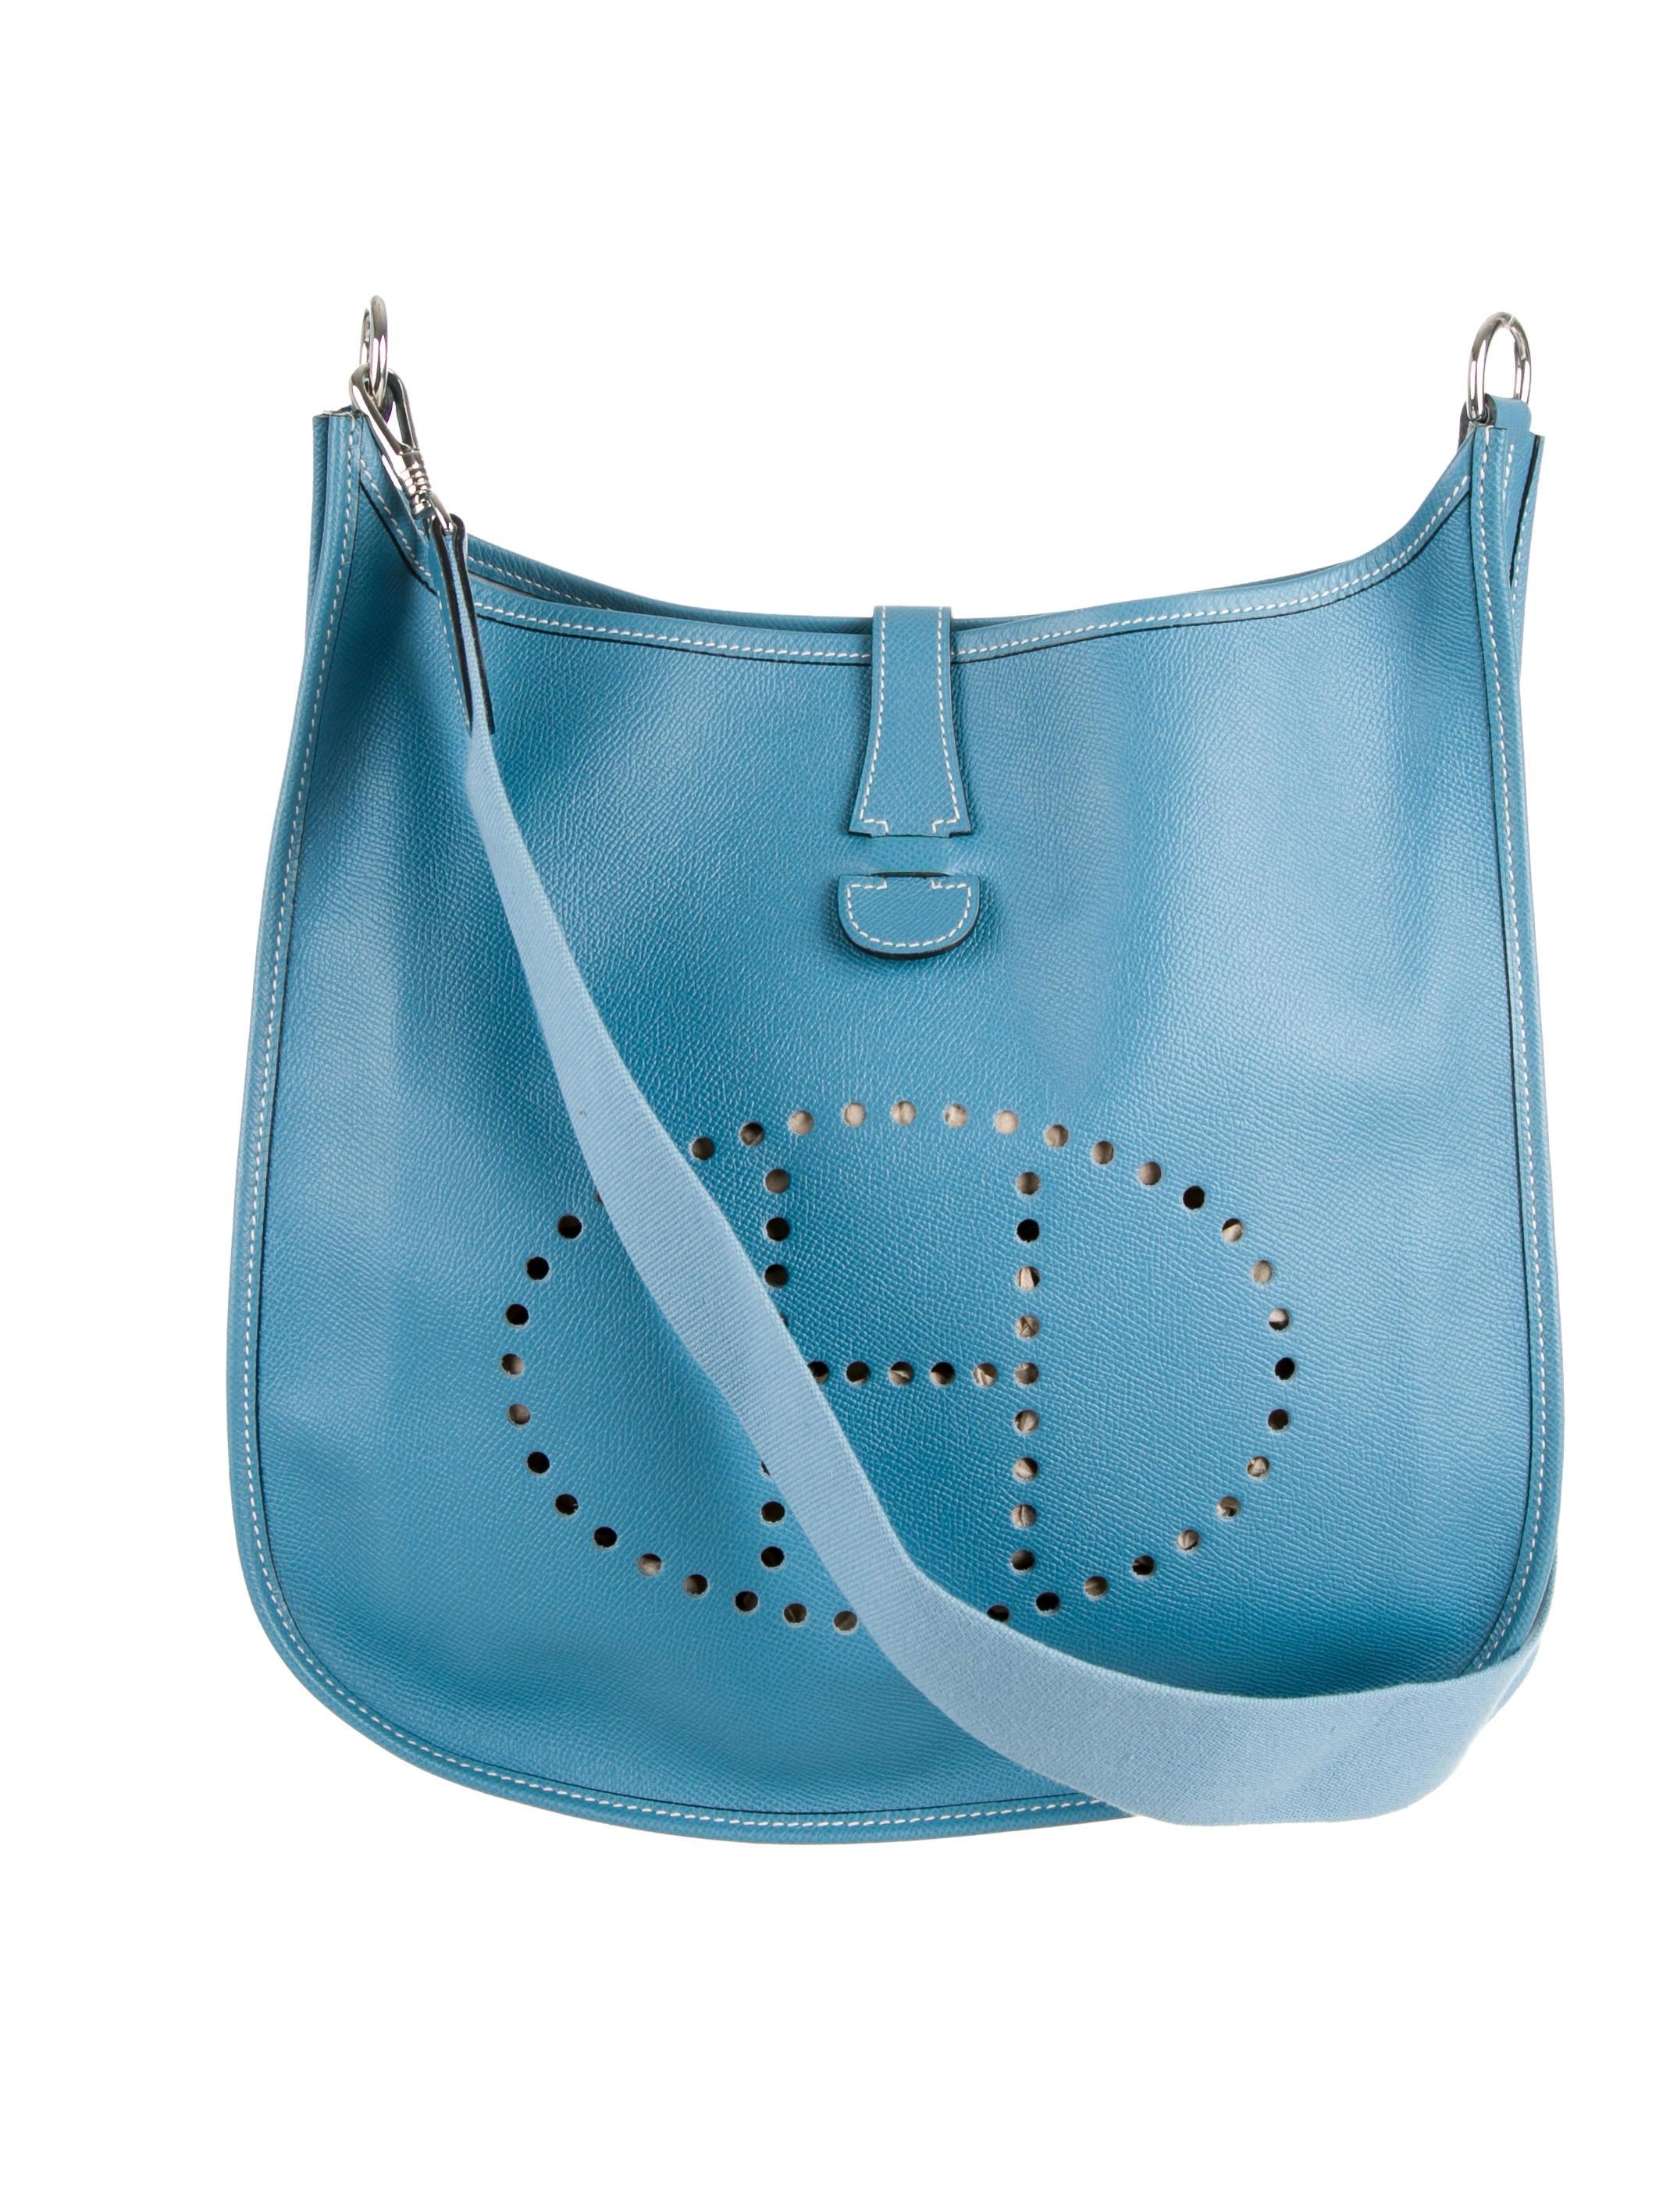 faux ostrich handbag - Herm��s Couchevel Evelyne I GM - Handbags - HER55158   The RealReal